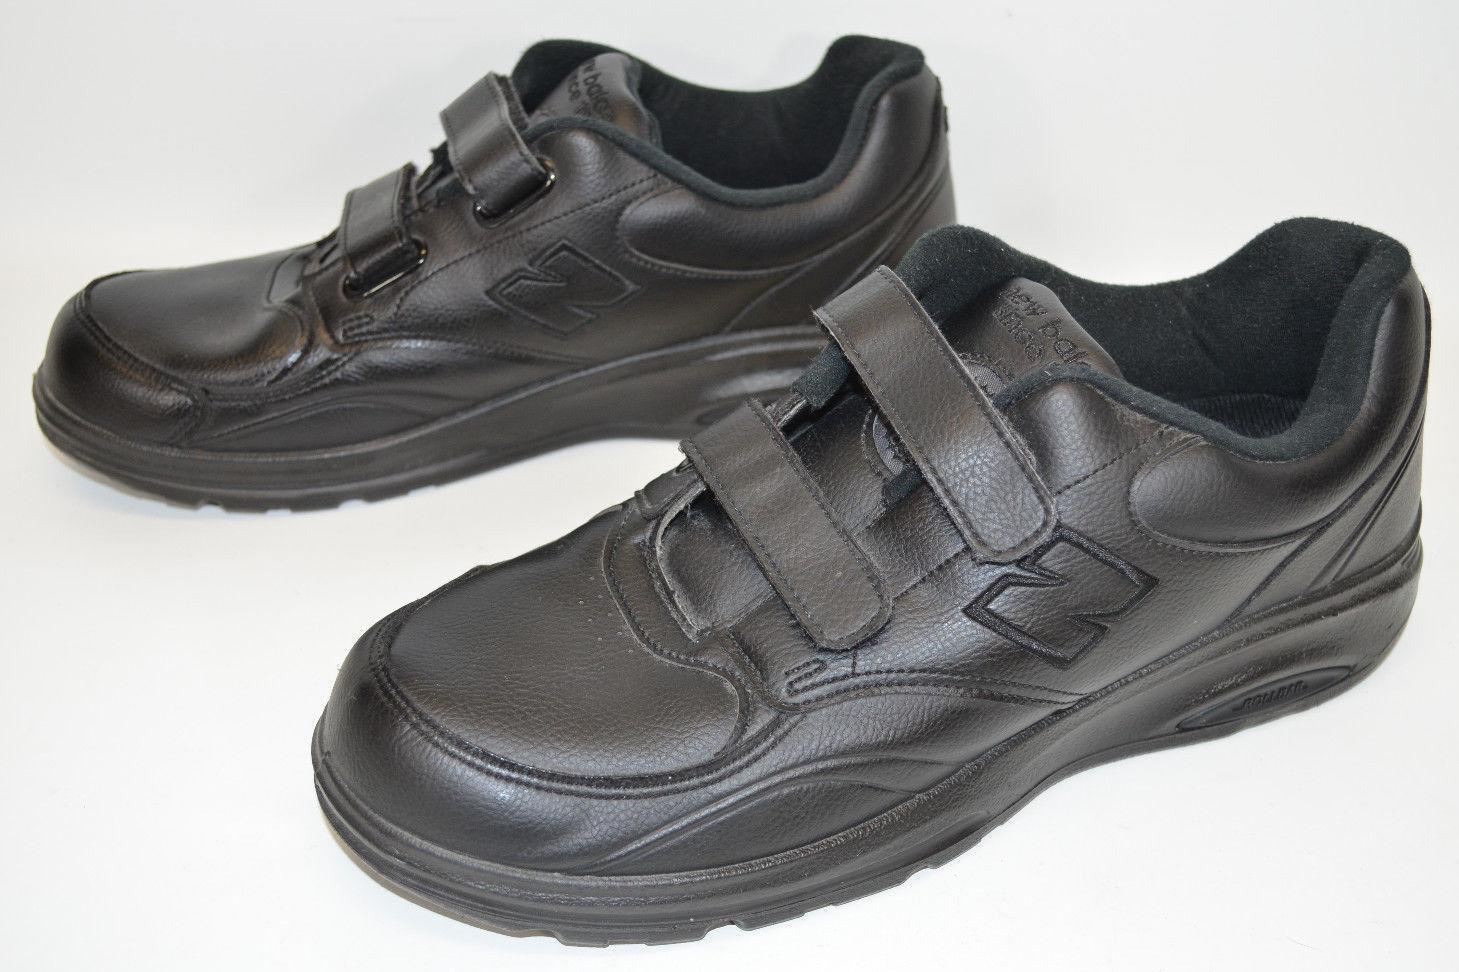 New Balance Walking Shoes MW812VK USA Black Hook/Loop Double Strap USA MW812VK Made Men 11 17e393